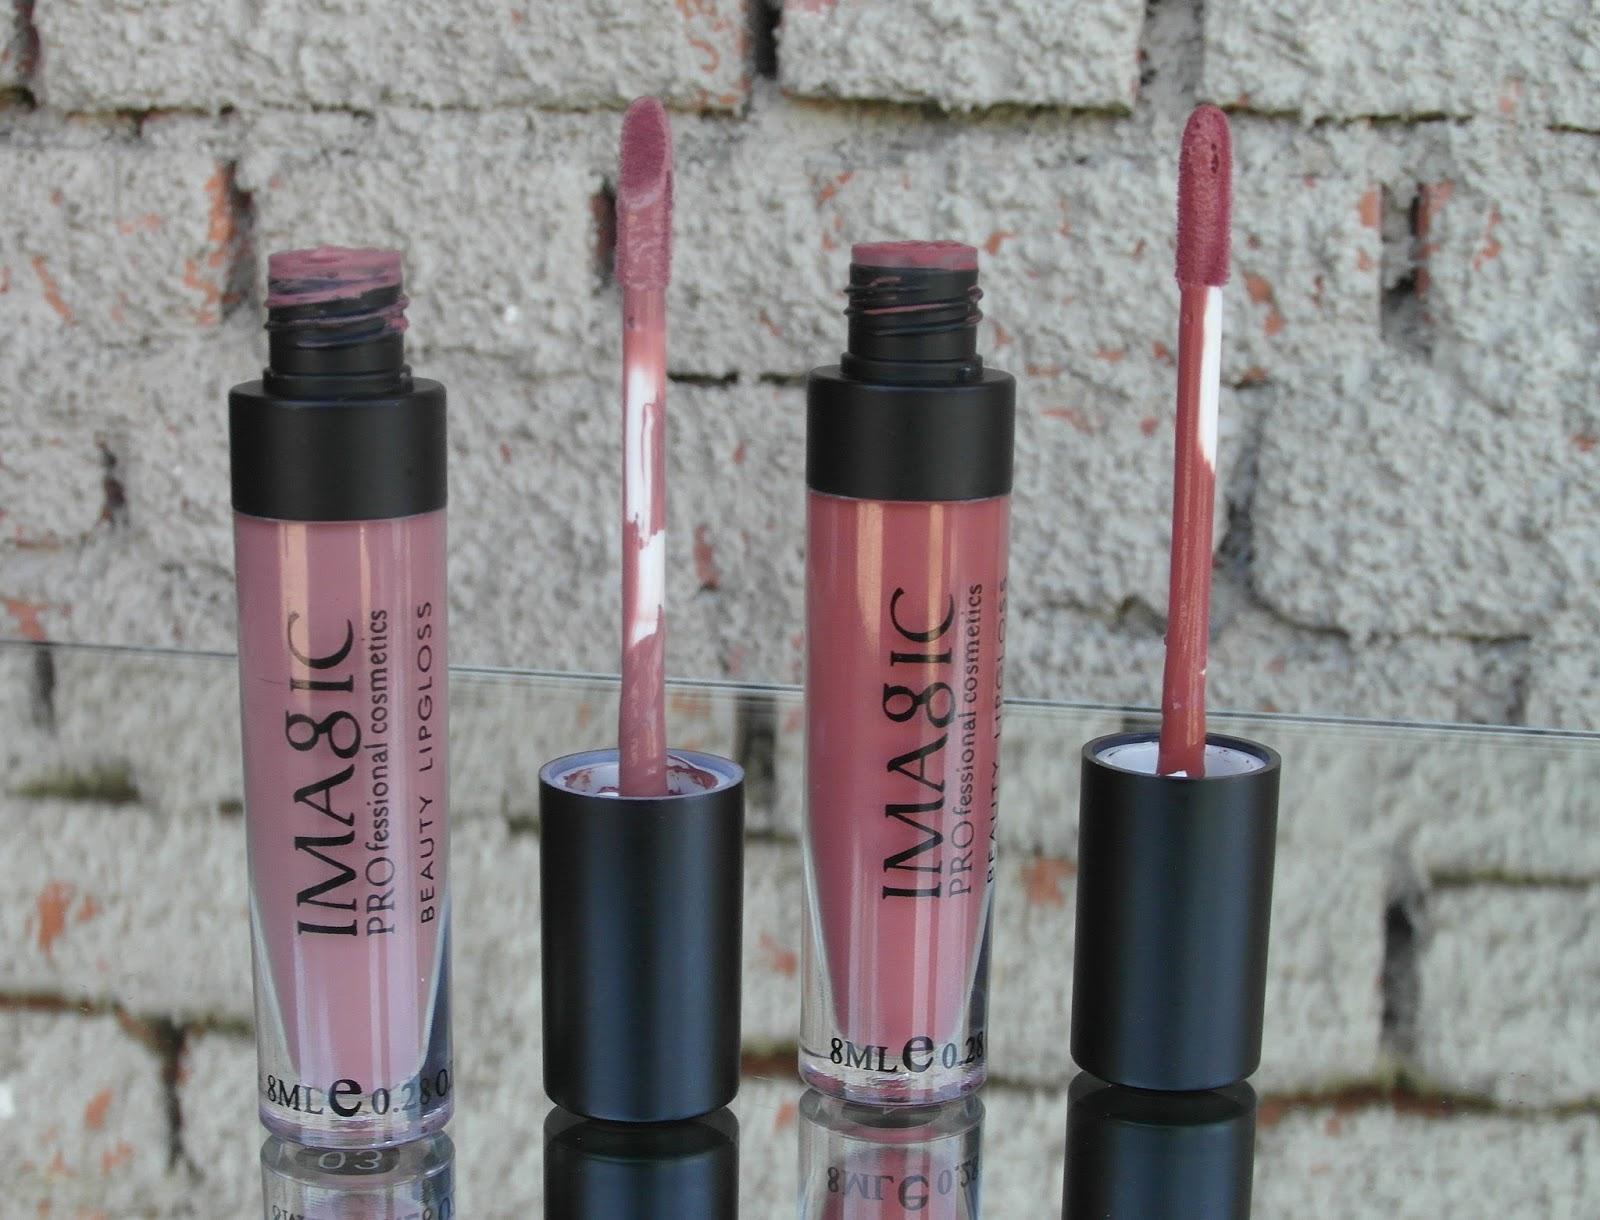 IMAGIC liquid lipstick in the shades 03 & 04!